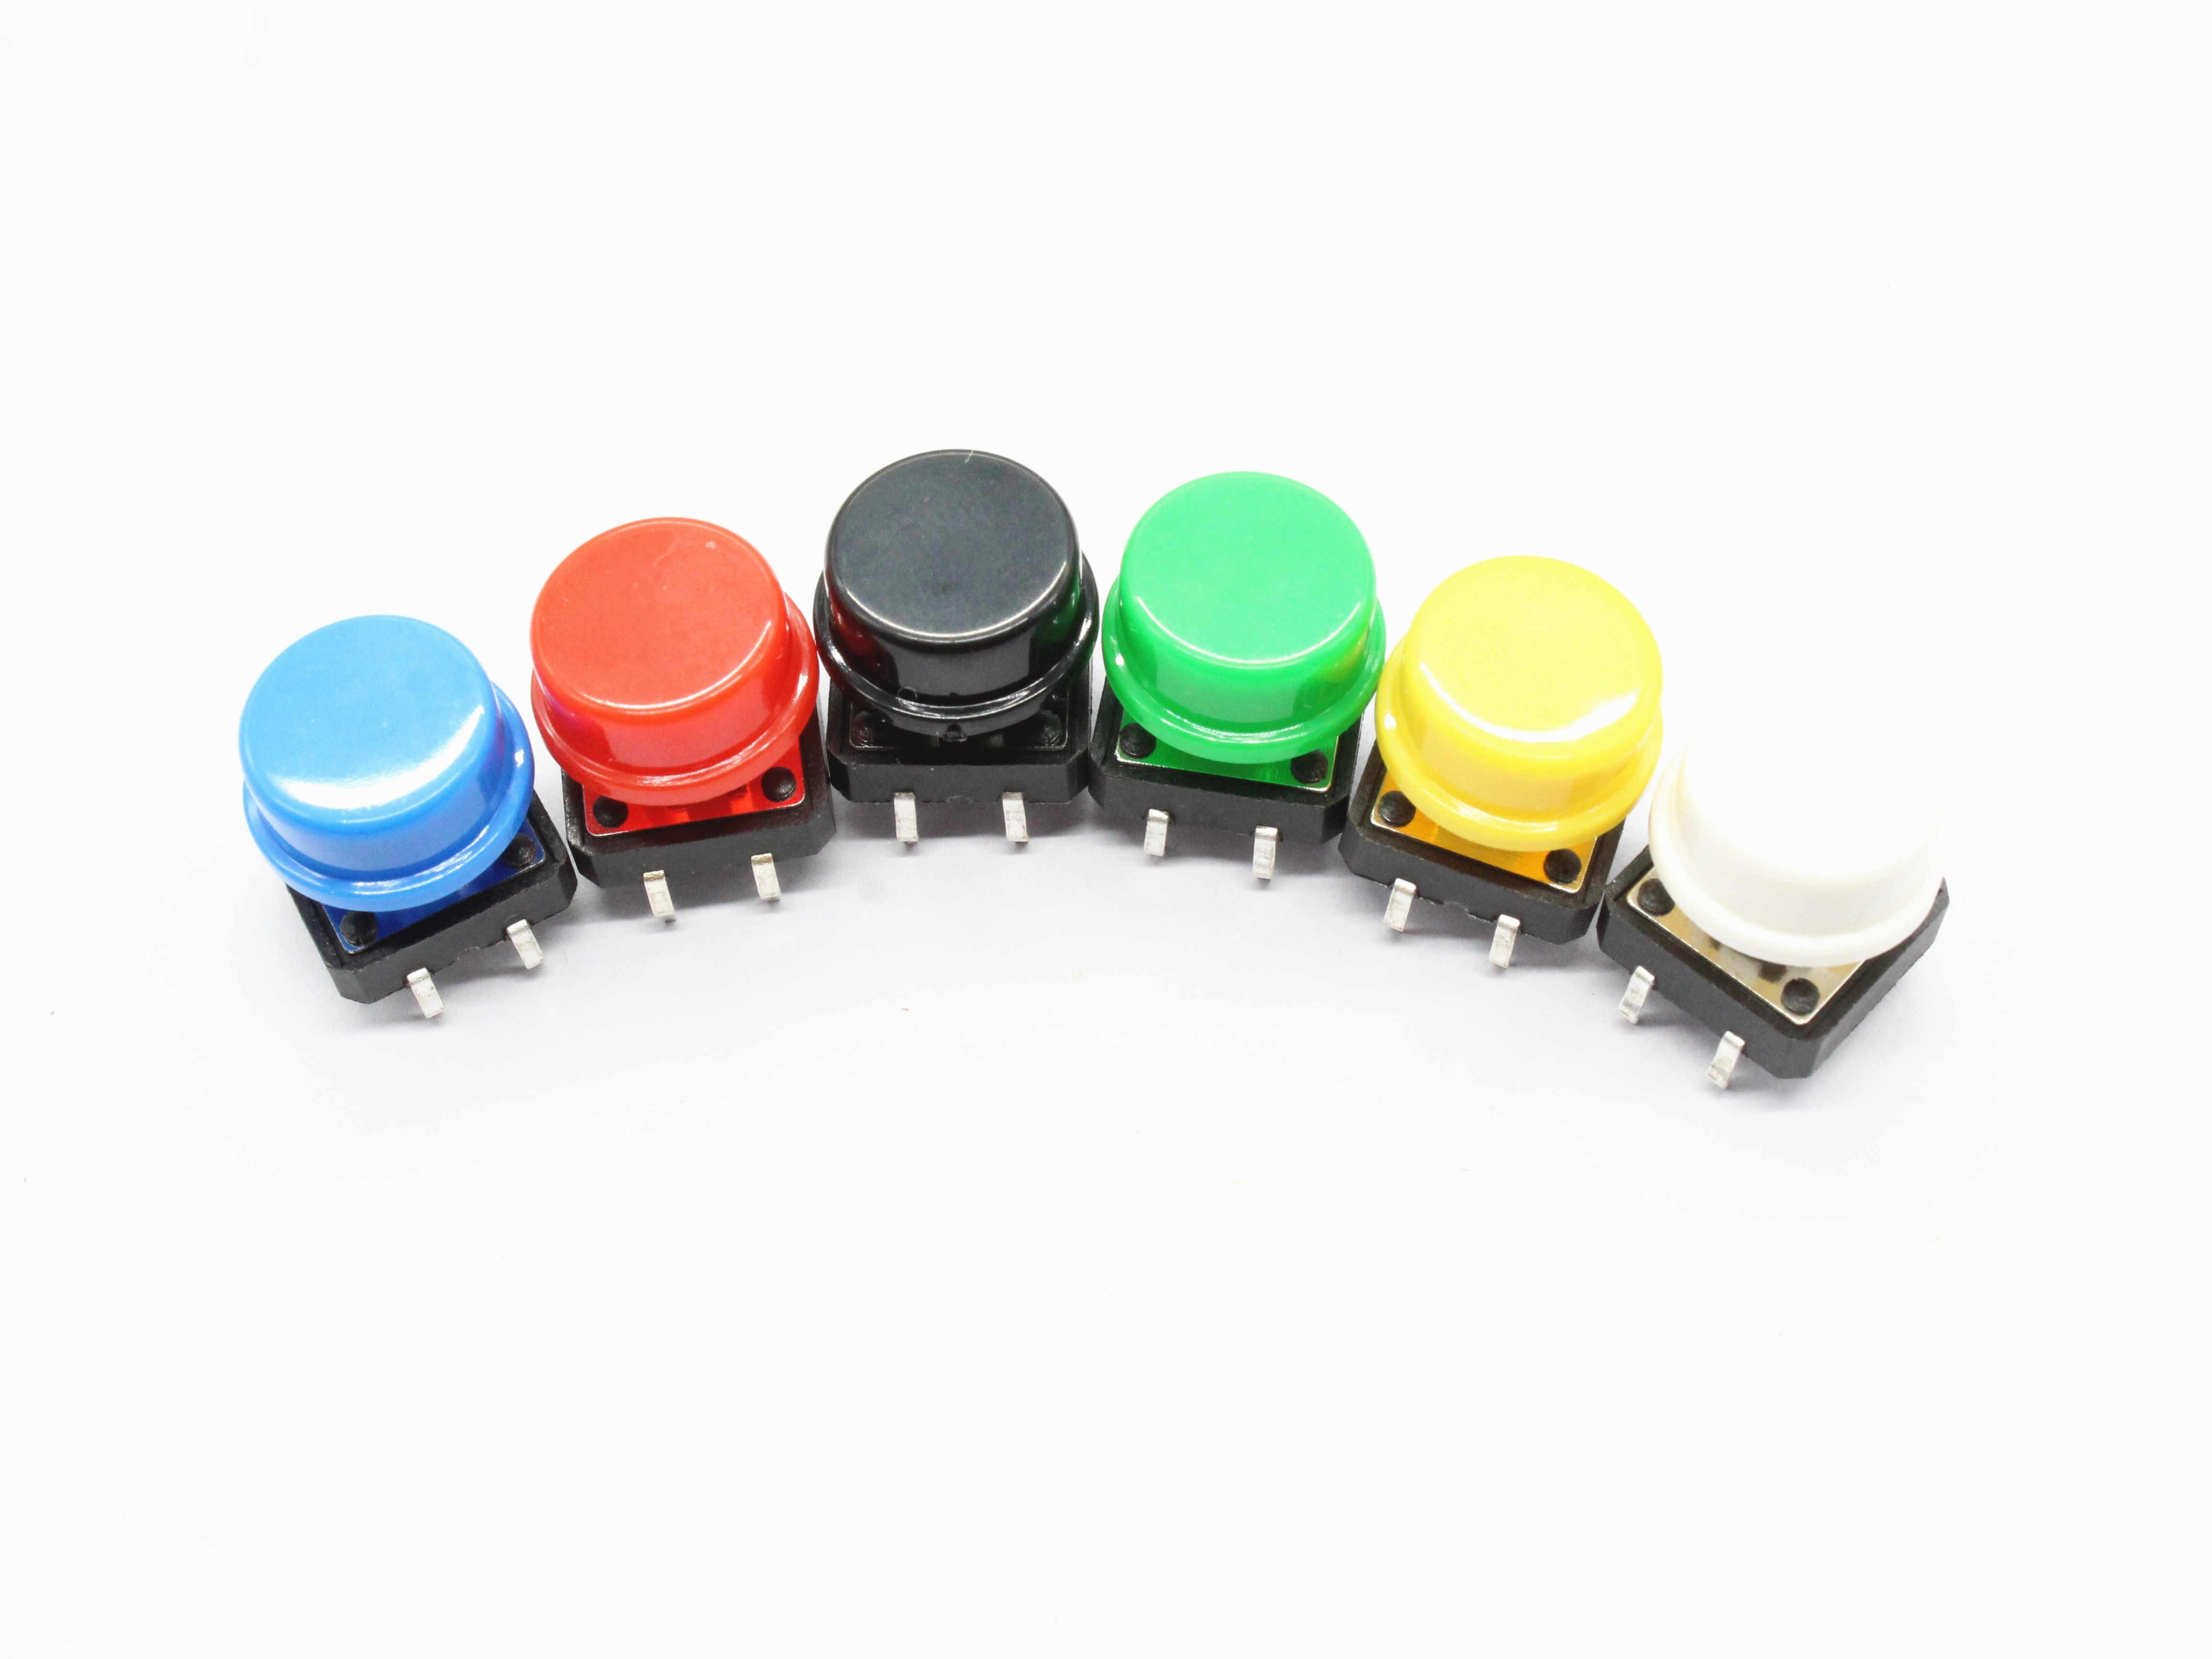 6 PCS 12X12 MM Grote sleutel module Grote knop module Light touch switch module met hoed Hoge niveau uitgang voor arduino usb